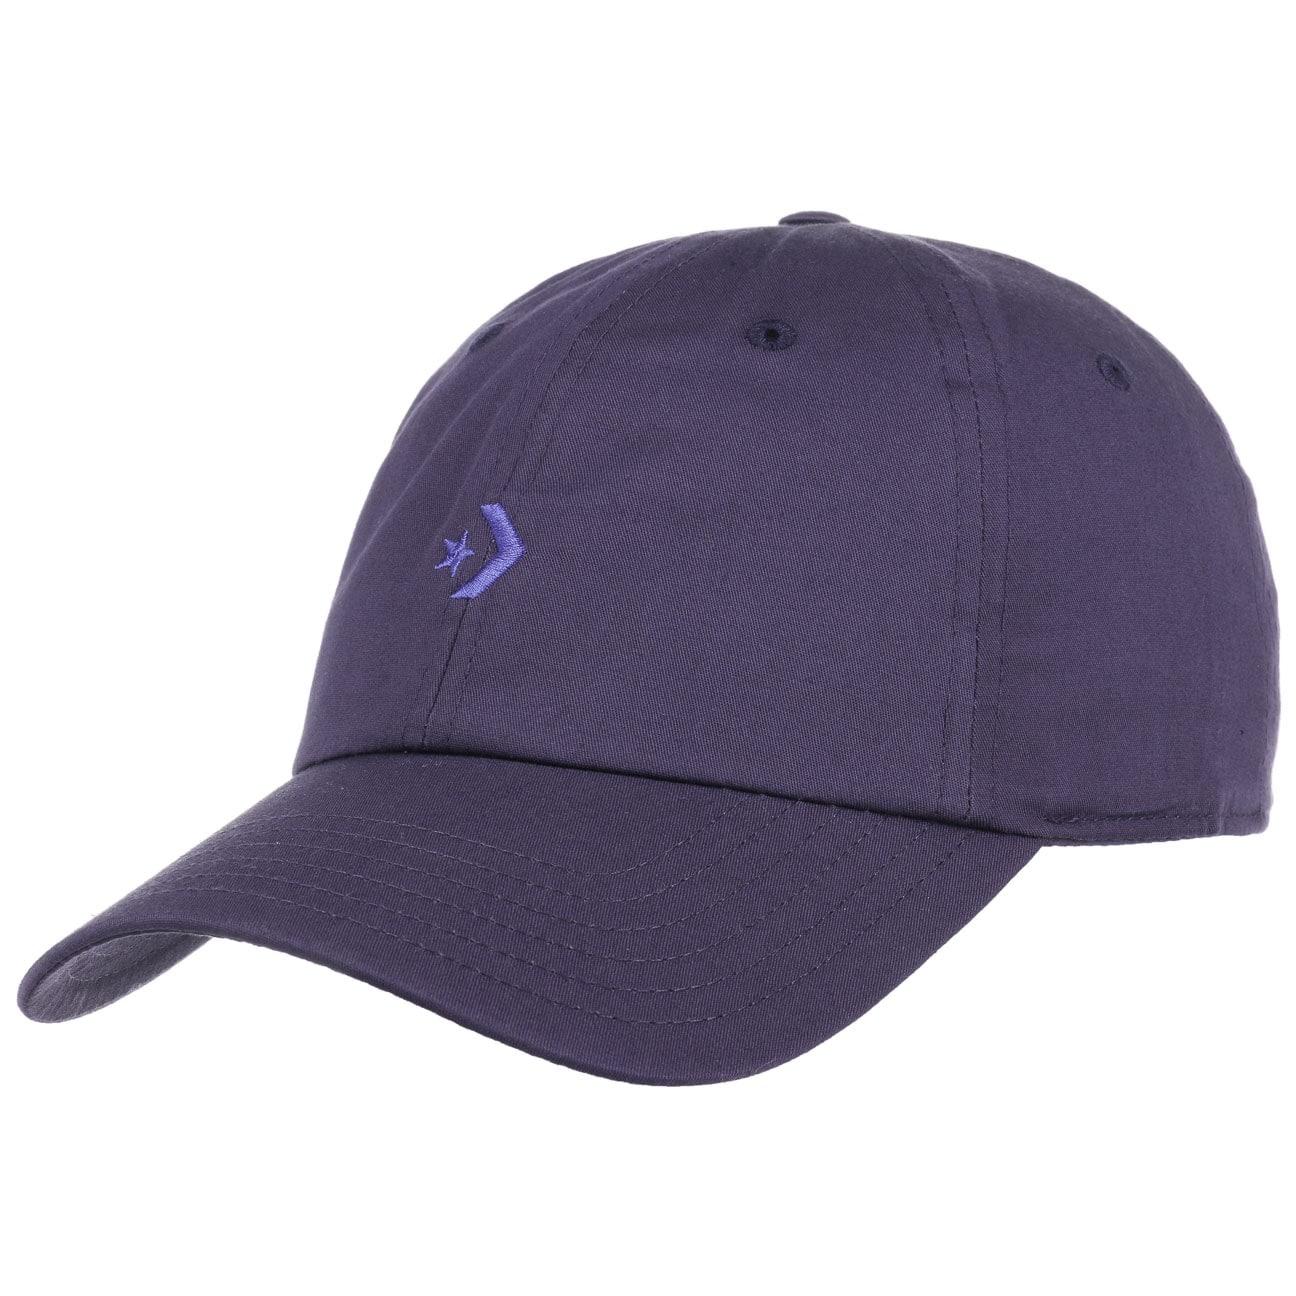 Casquette Strapback Logo by Converse  baseball cap